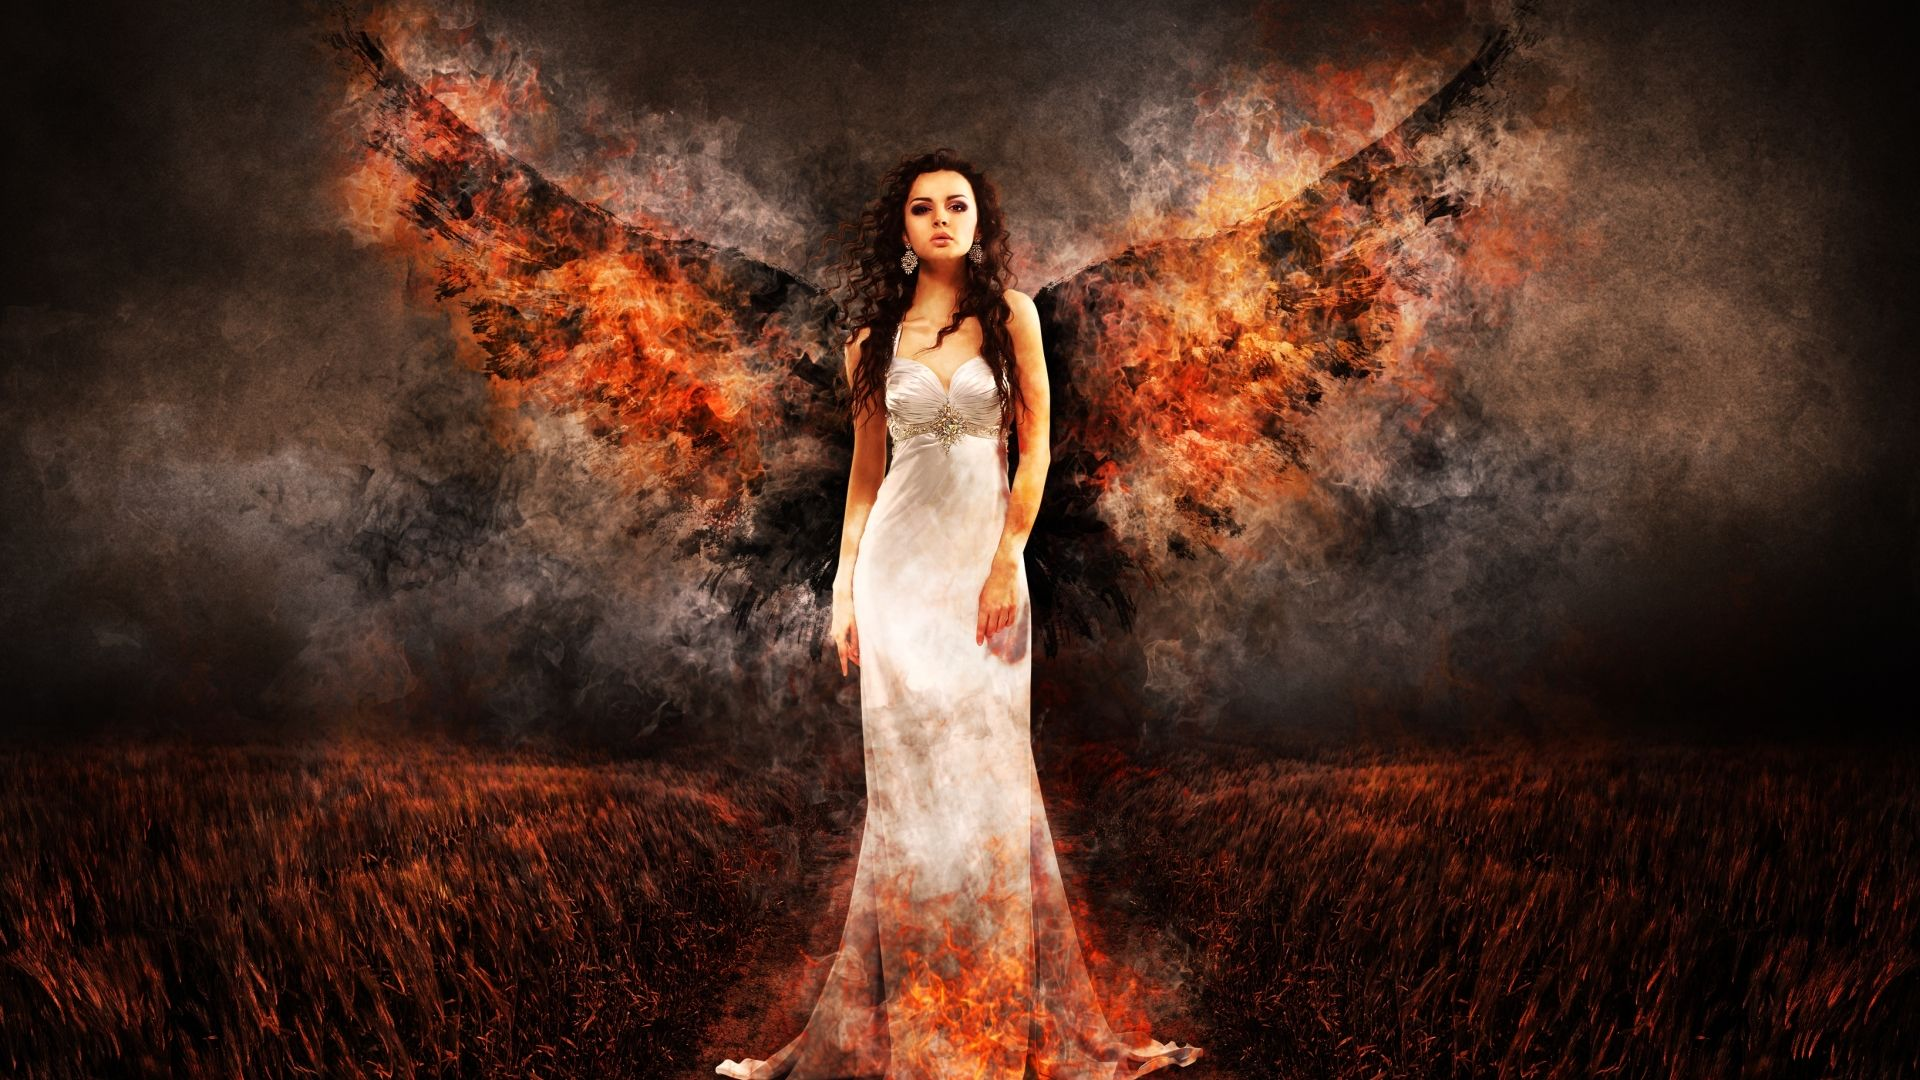 Wallpaper Of Angel Fire Wings Angel Pictures Angel Angel Fire